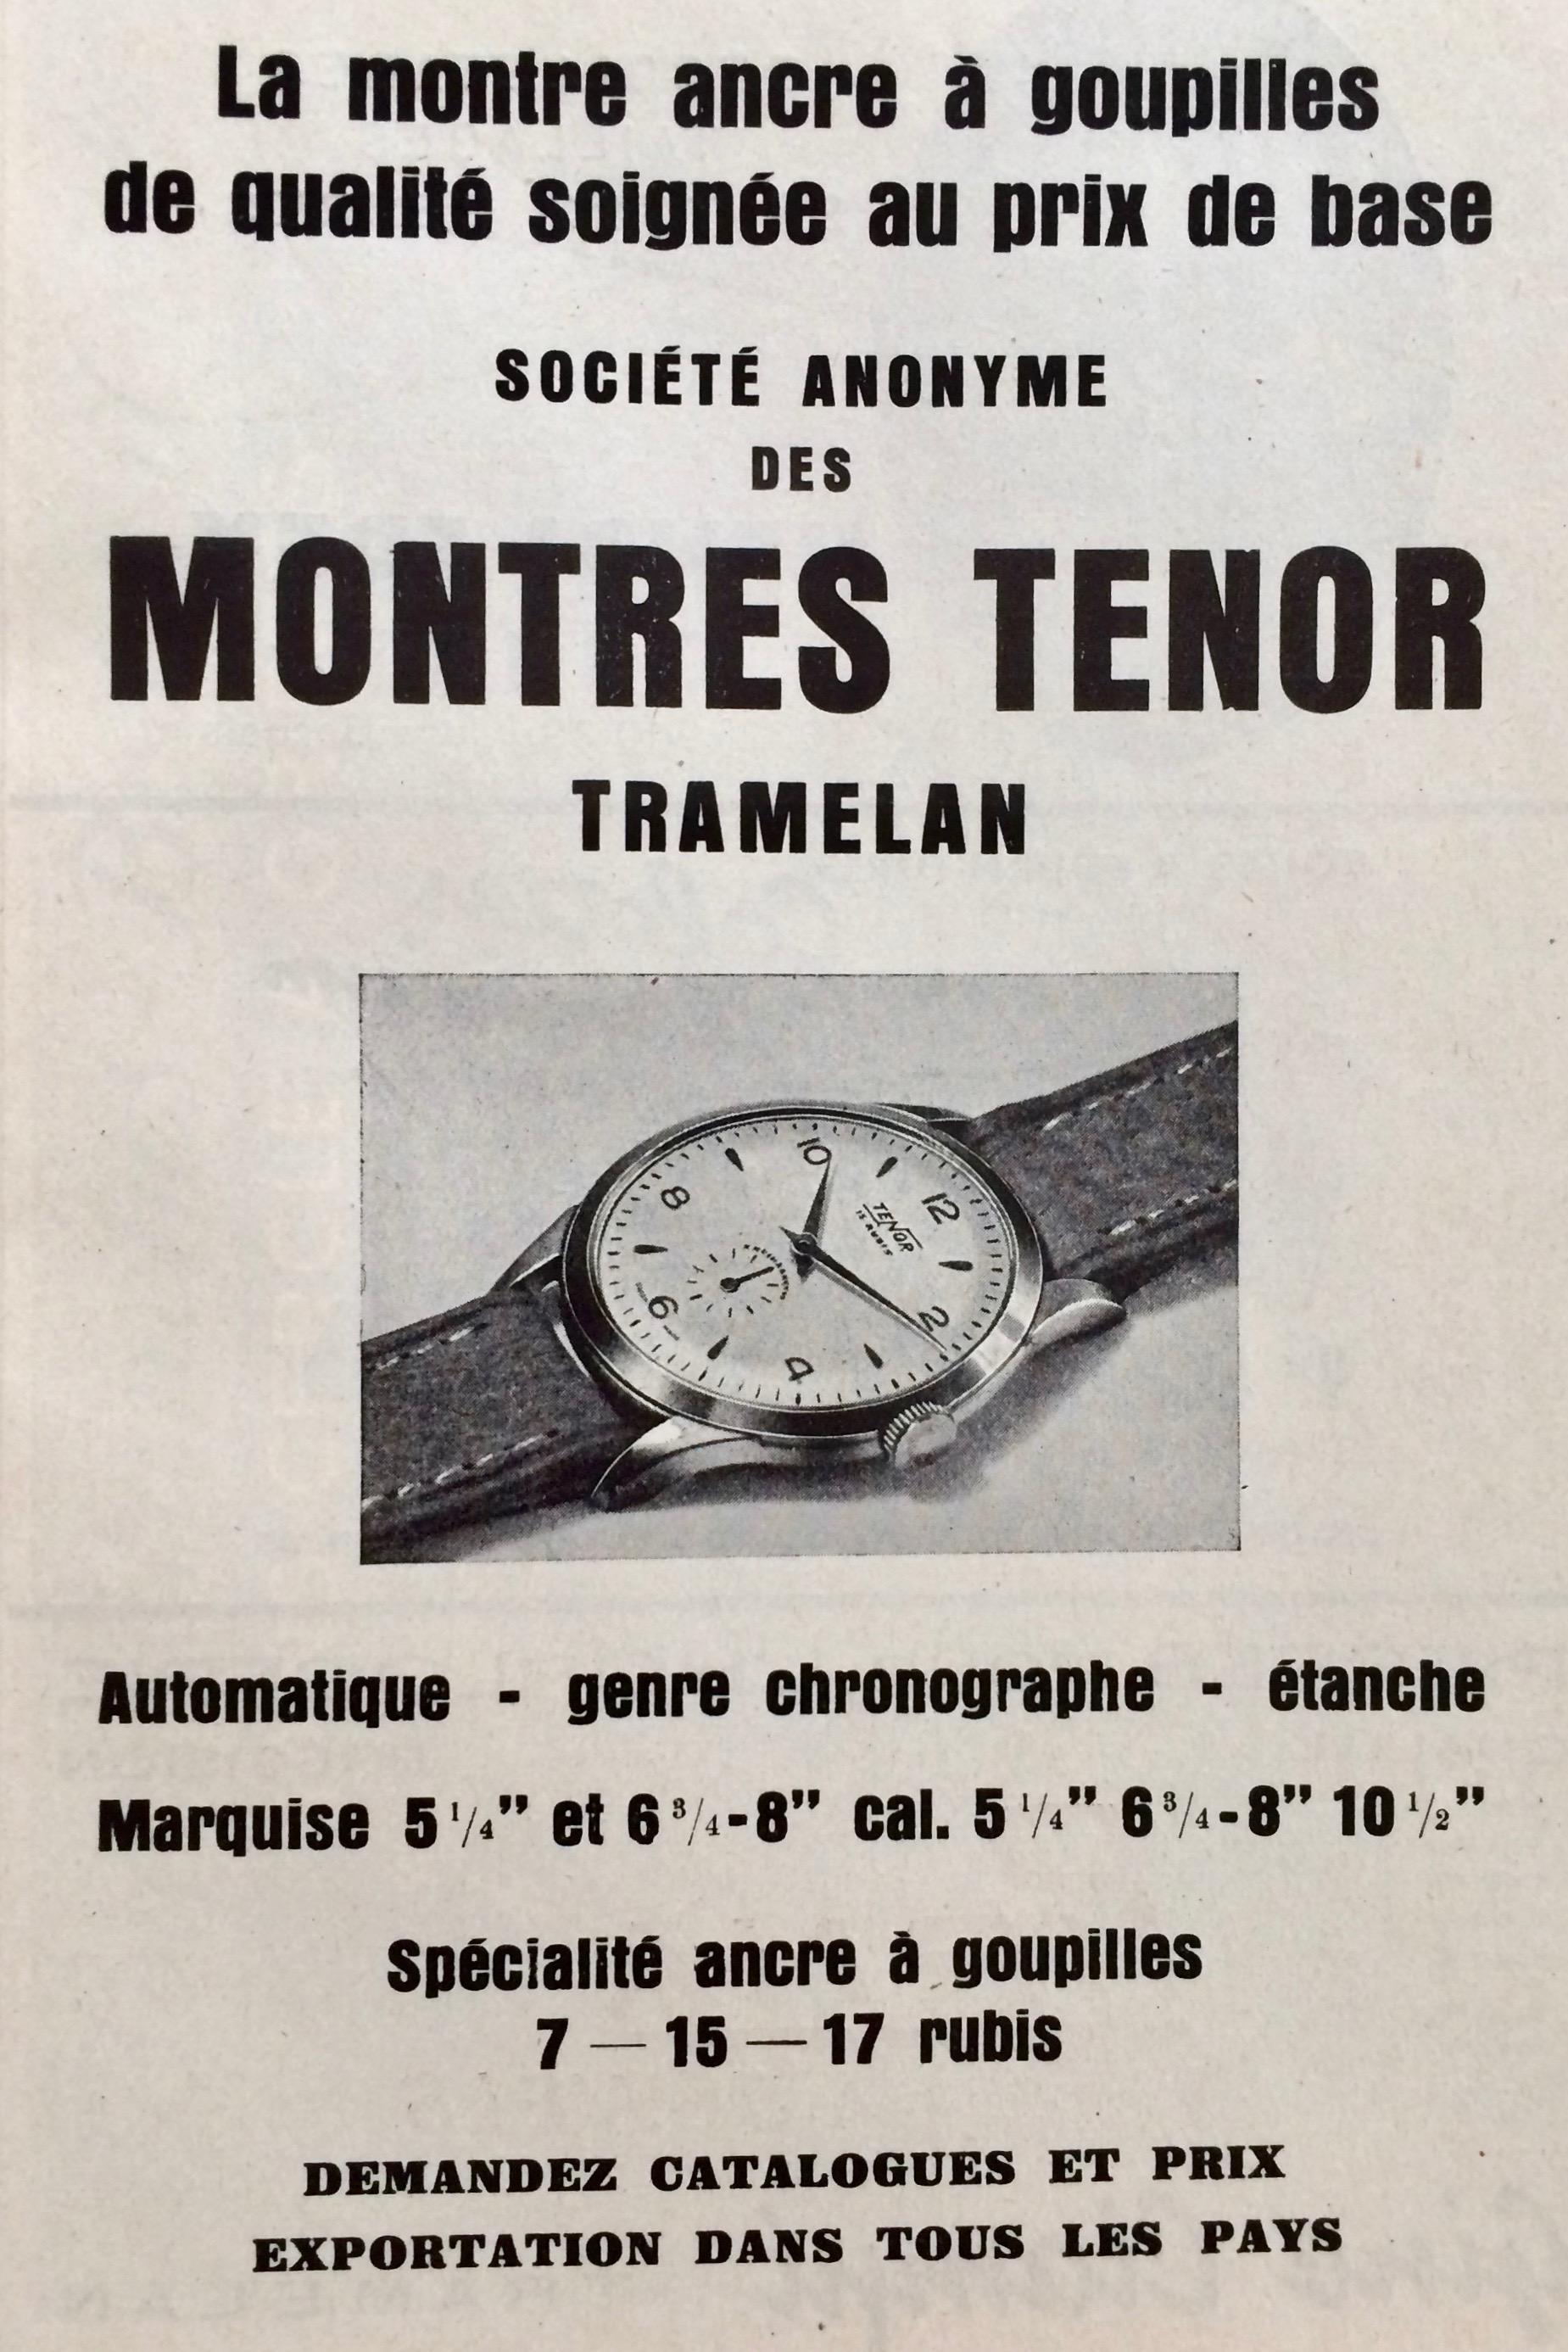 1487781476_Tenor_montres_tramelan_ancre_